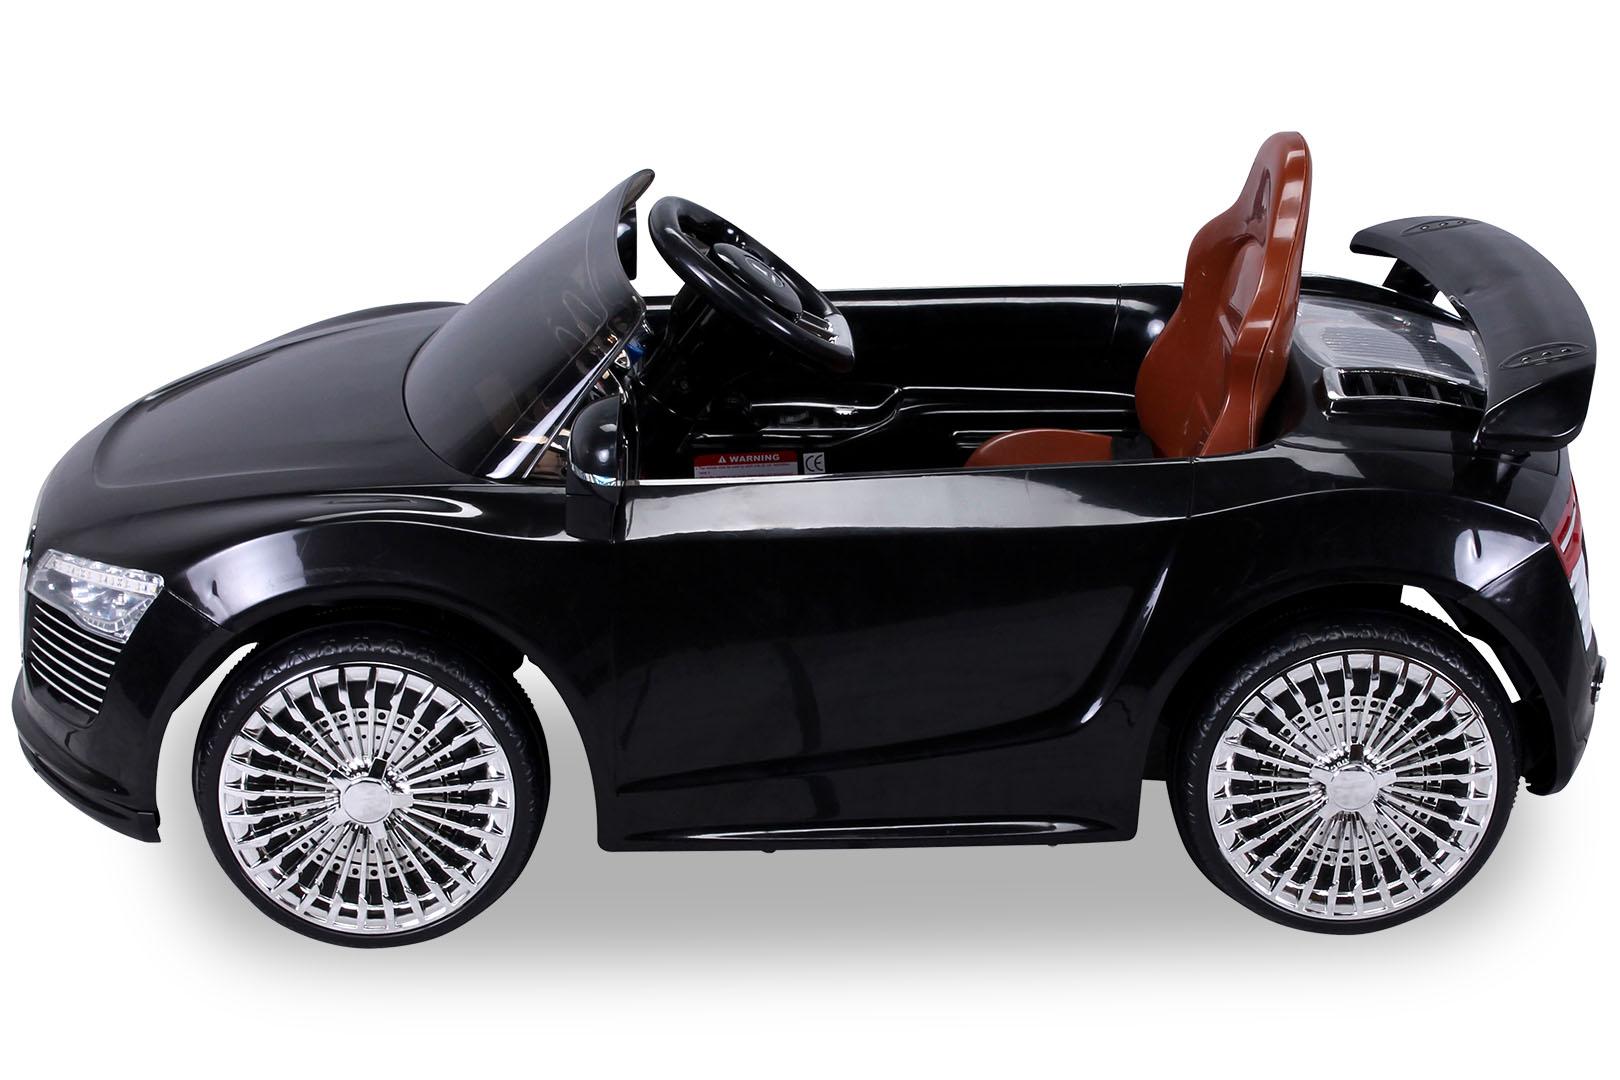 enfants voiture lectrique audi r8 style pour v hicule 9926. Black Bedroom Furniture Sets. Home Design Ideas